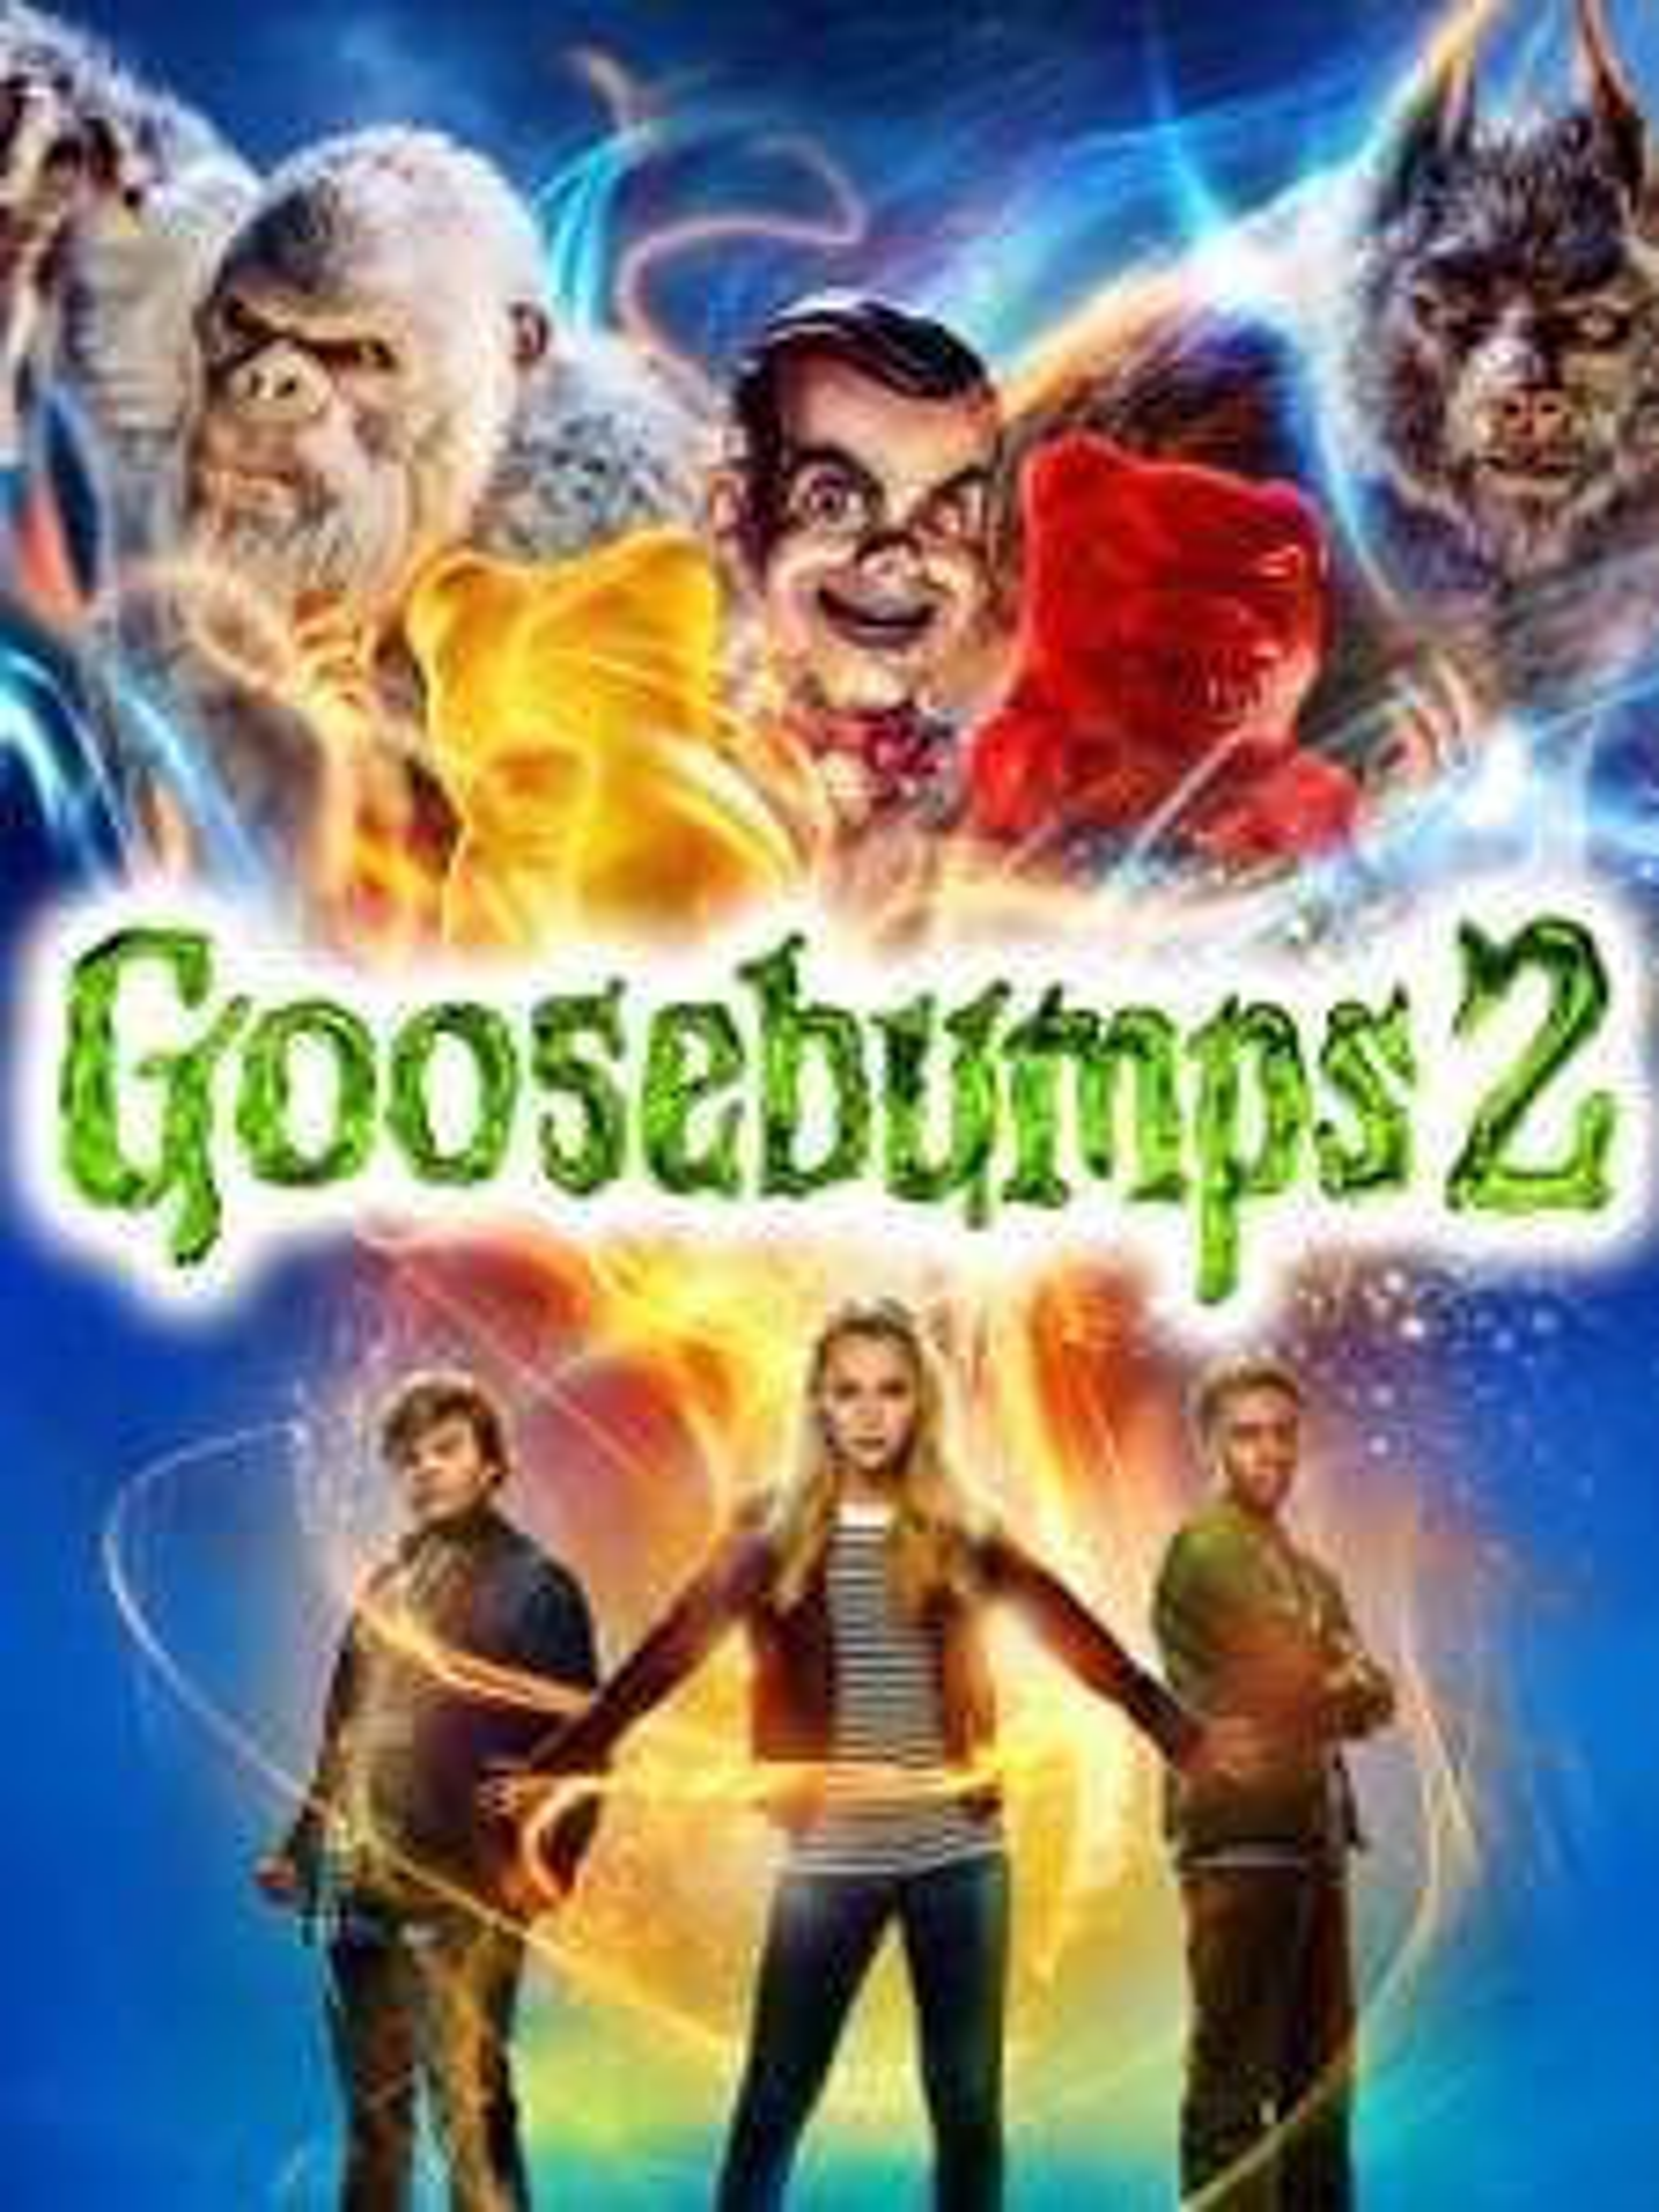 Goosebumps 2 (4K/HDR) £2.99 @ iTunes